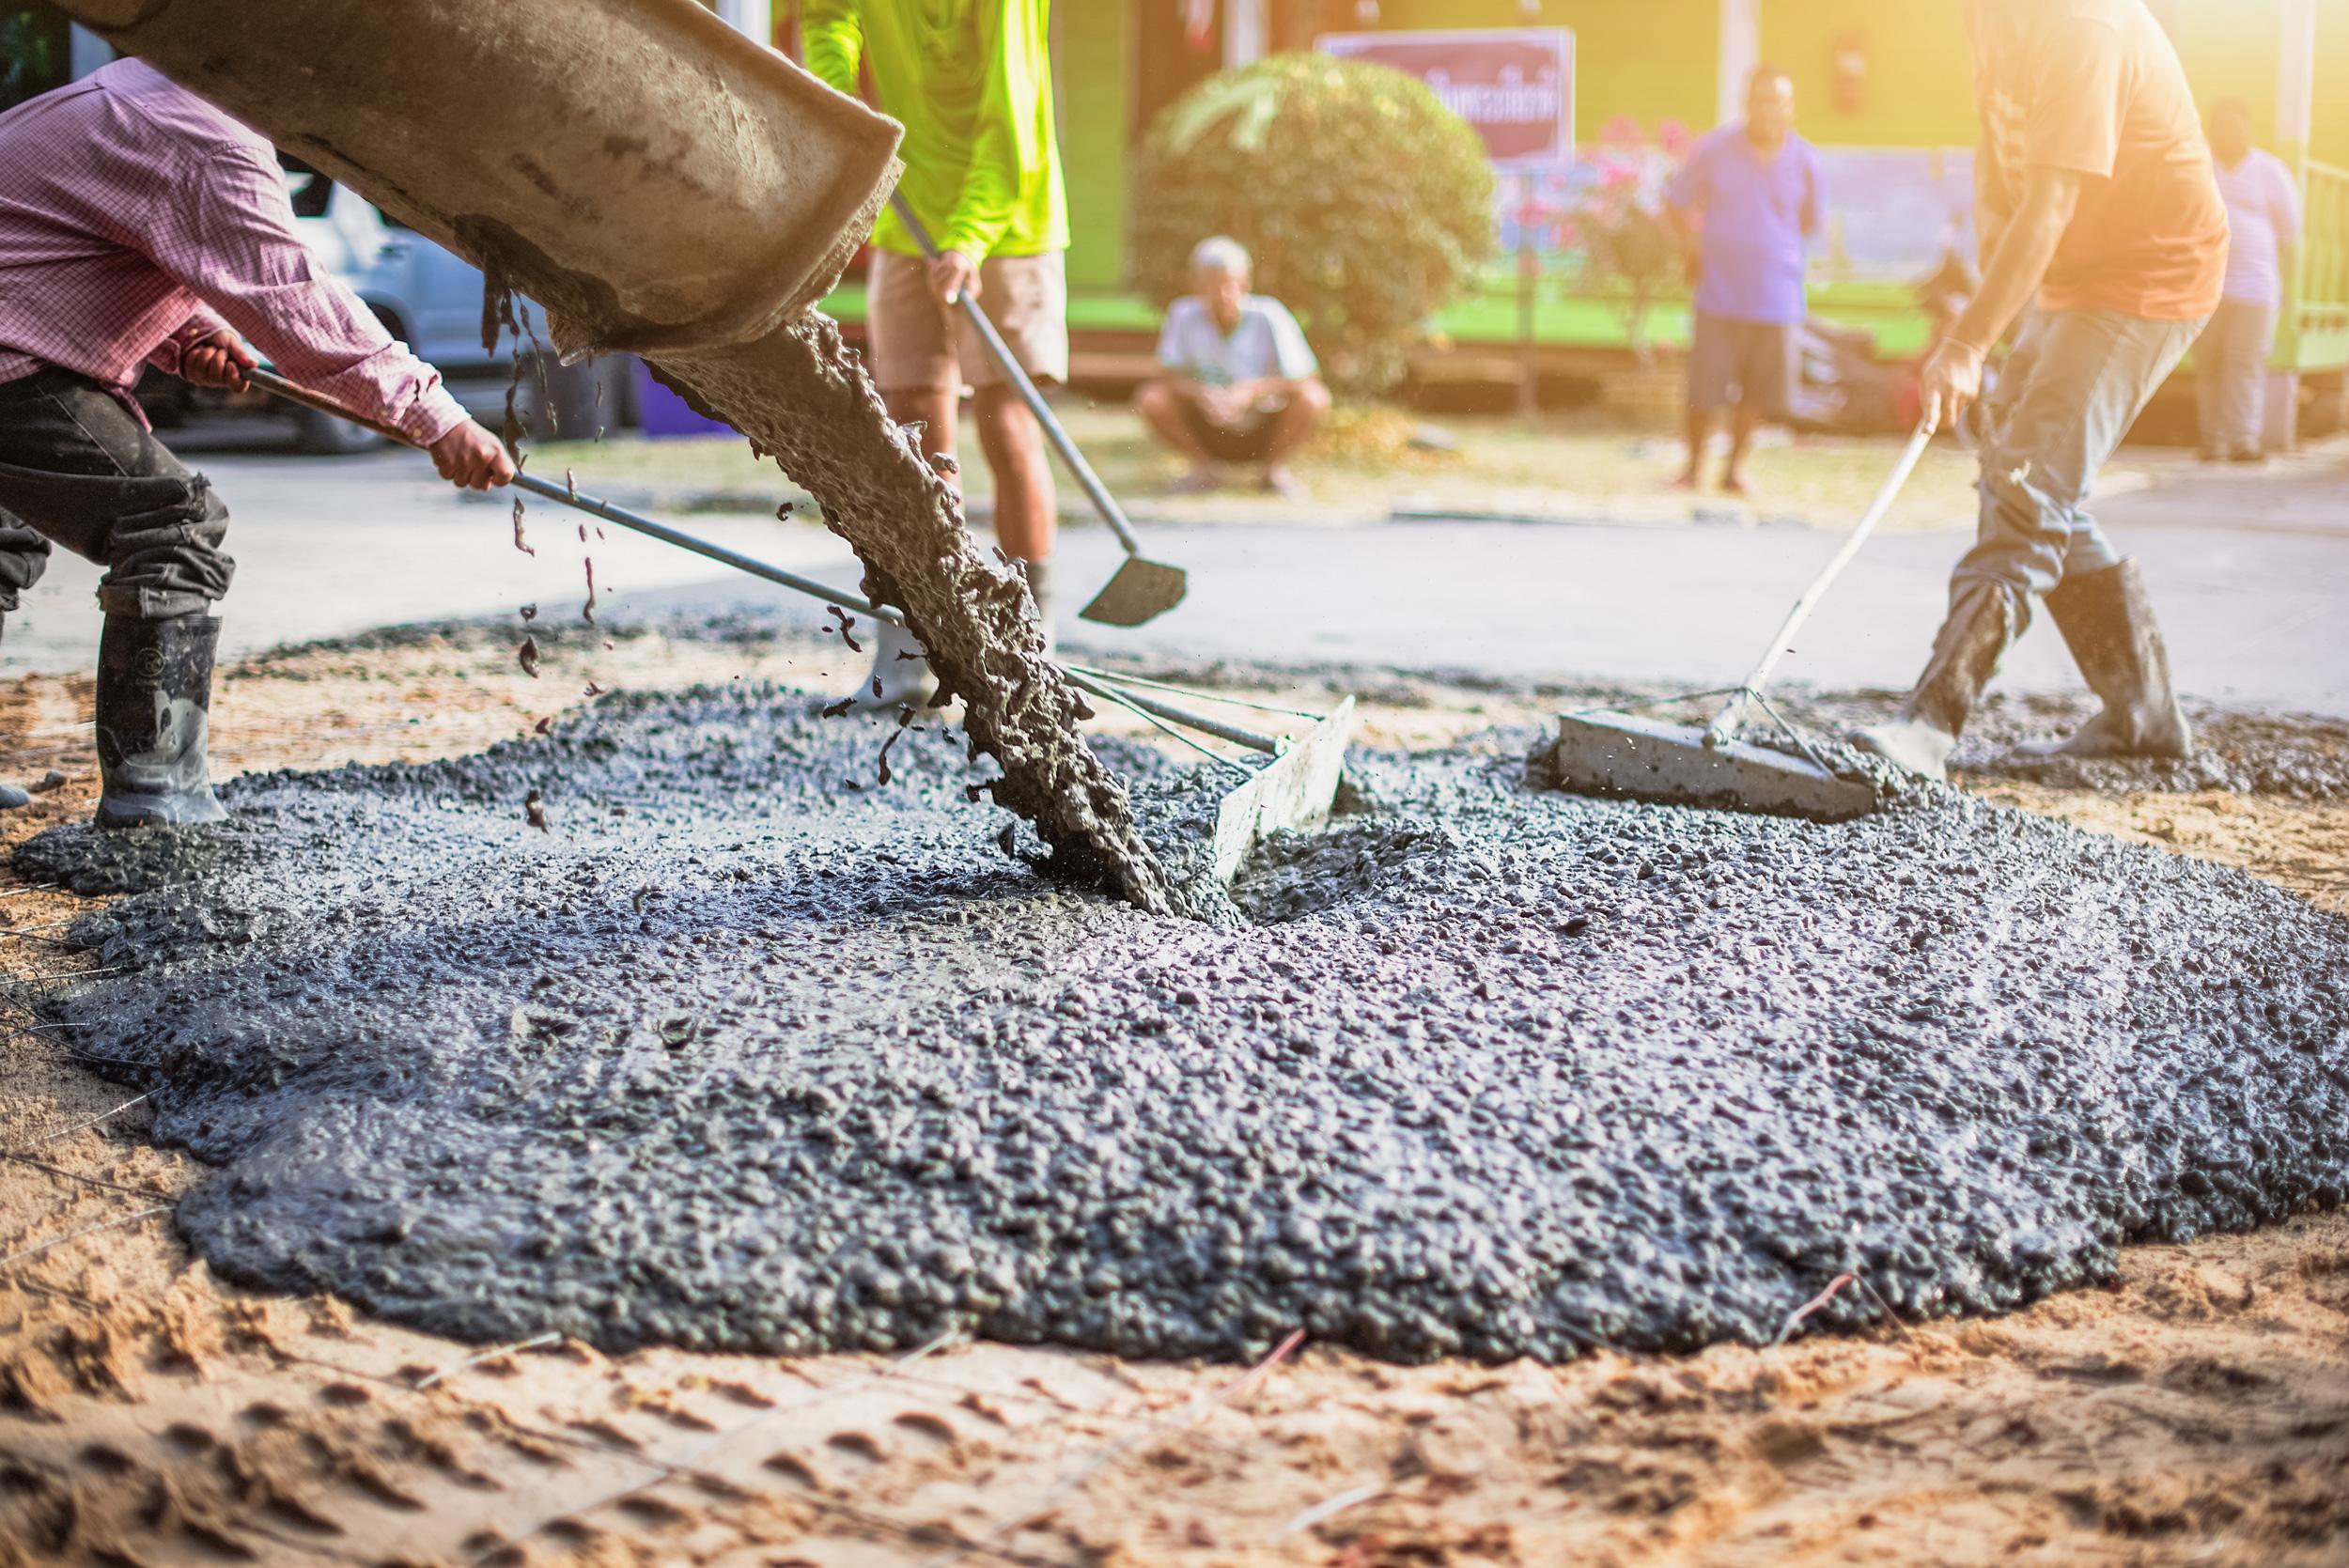 Utah's Premier Commercial and Residential Concrete Contractors